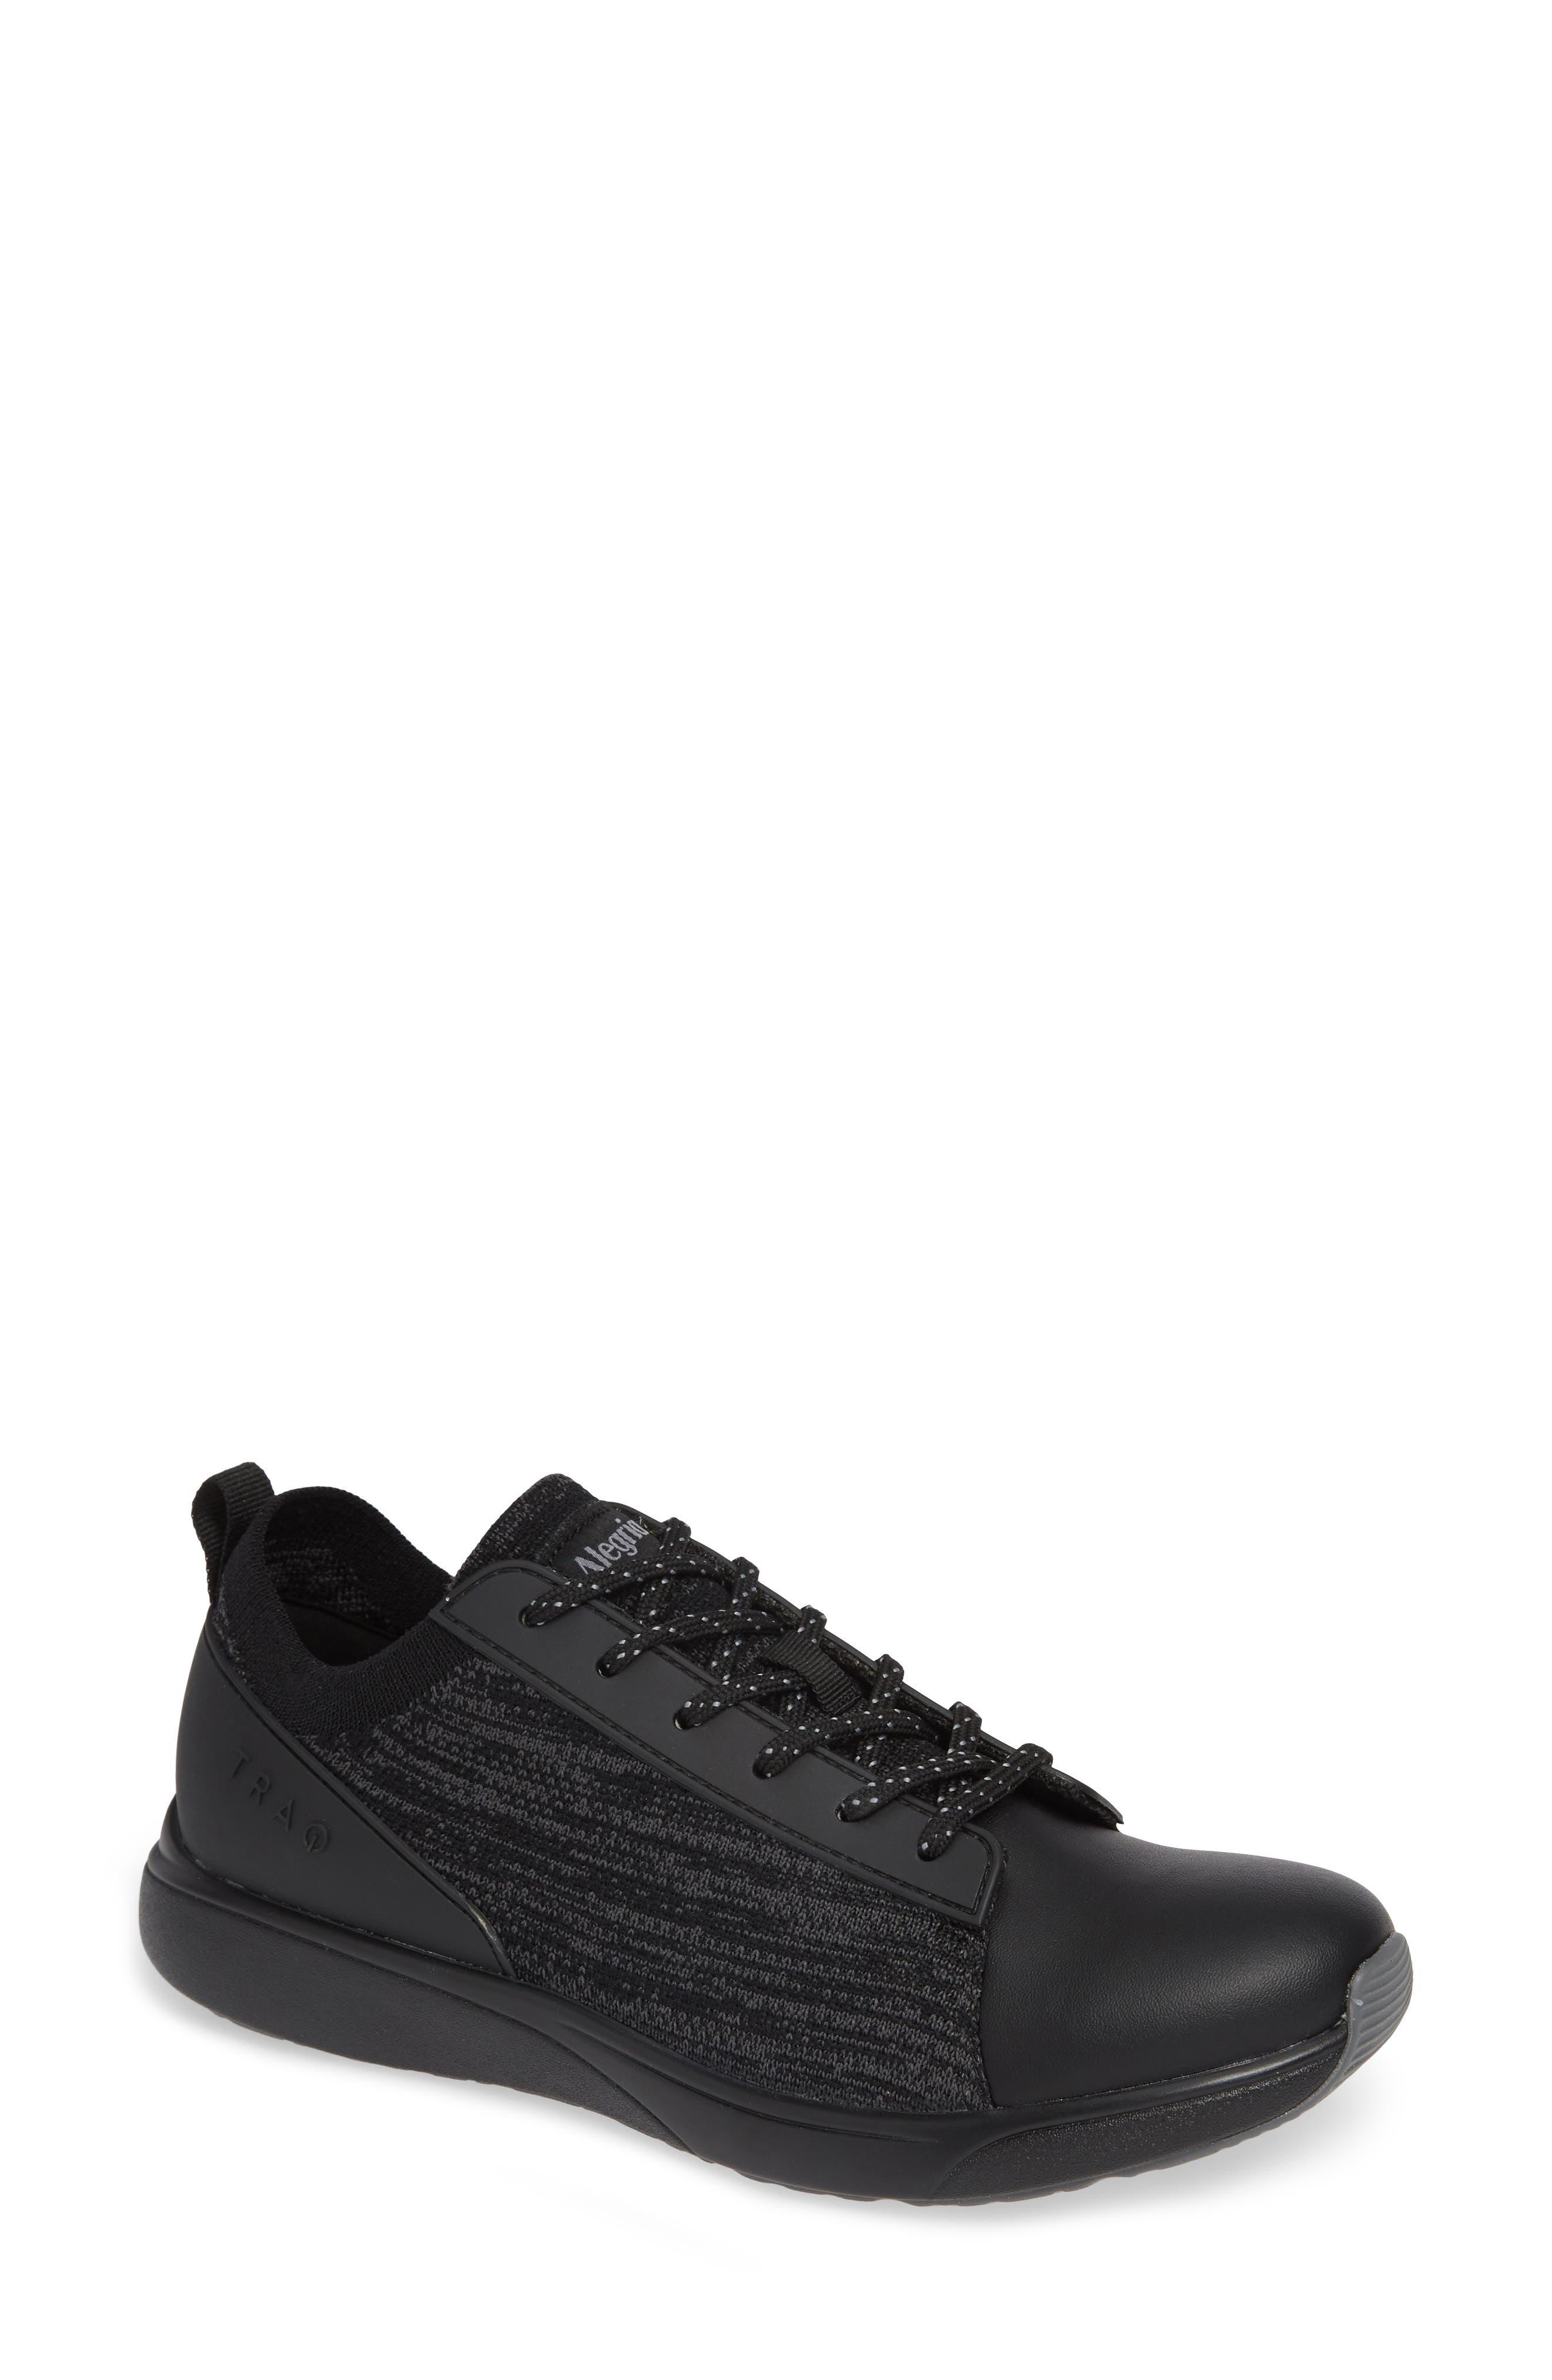 ALEGRIA, Qest Sneaker, Main thumbnail 1, color, BLACK LEATHER